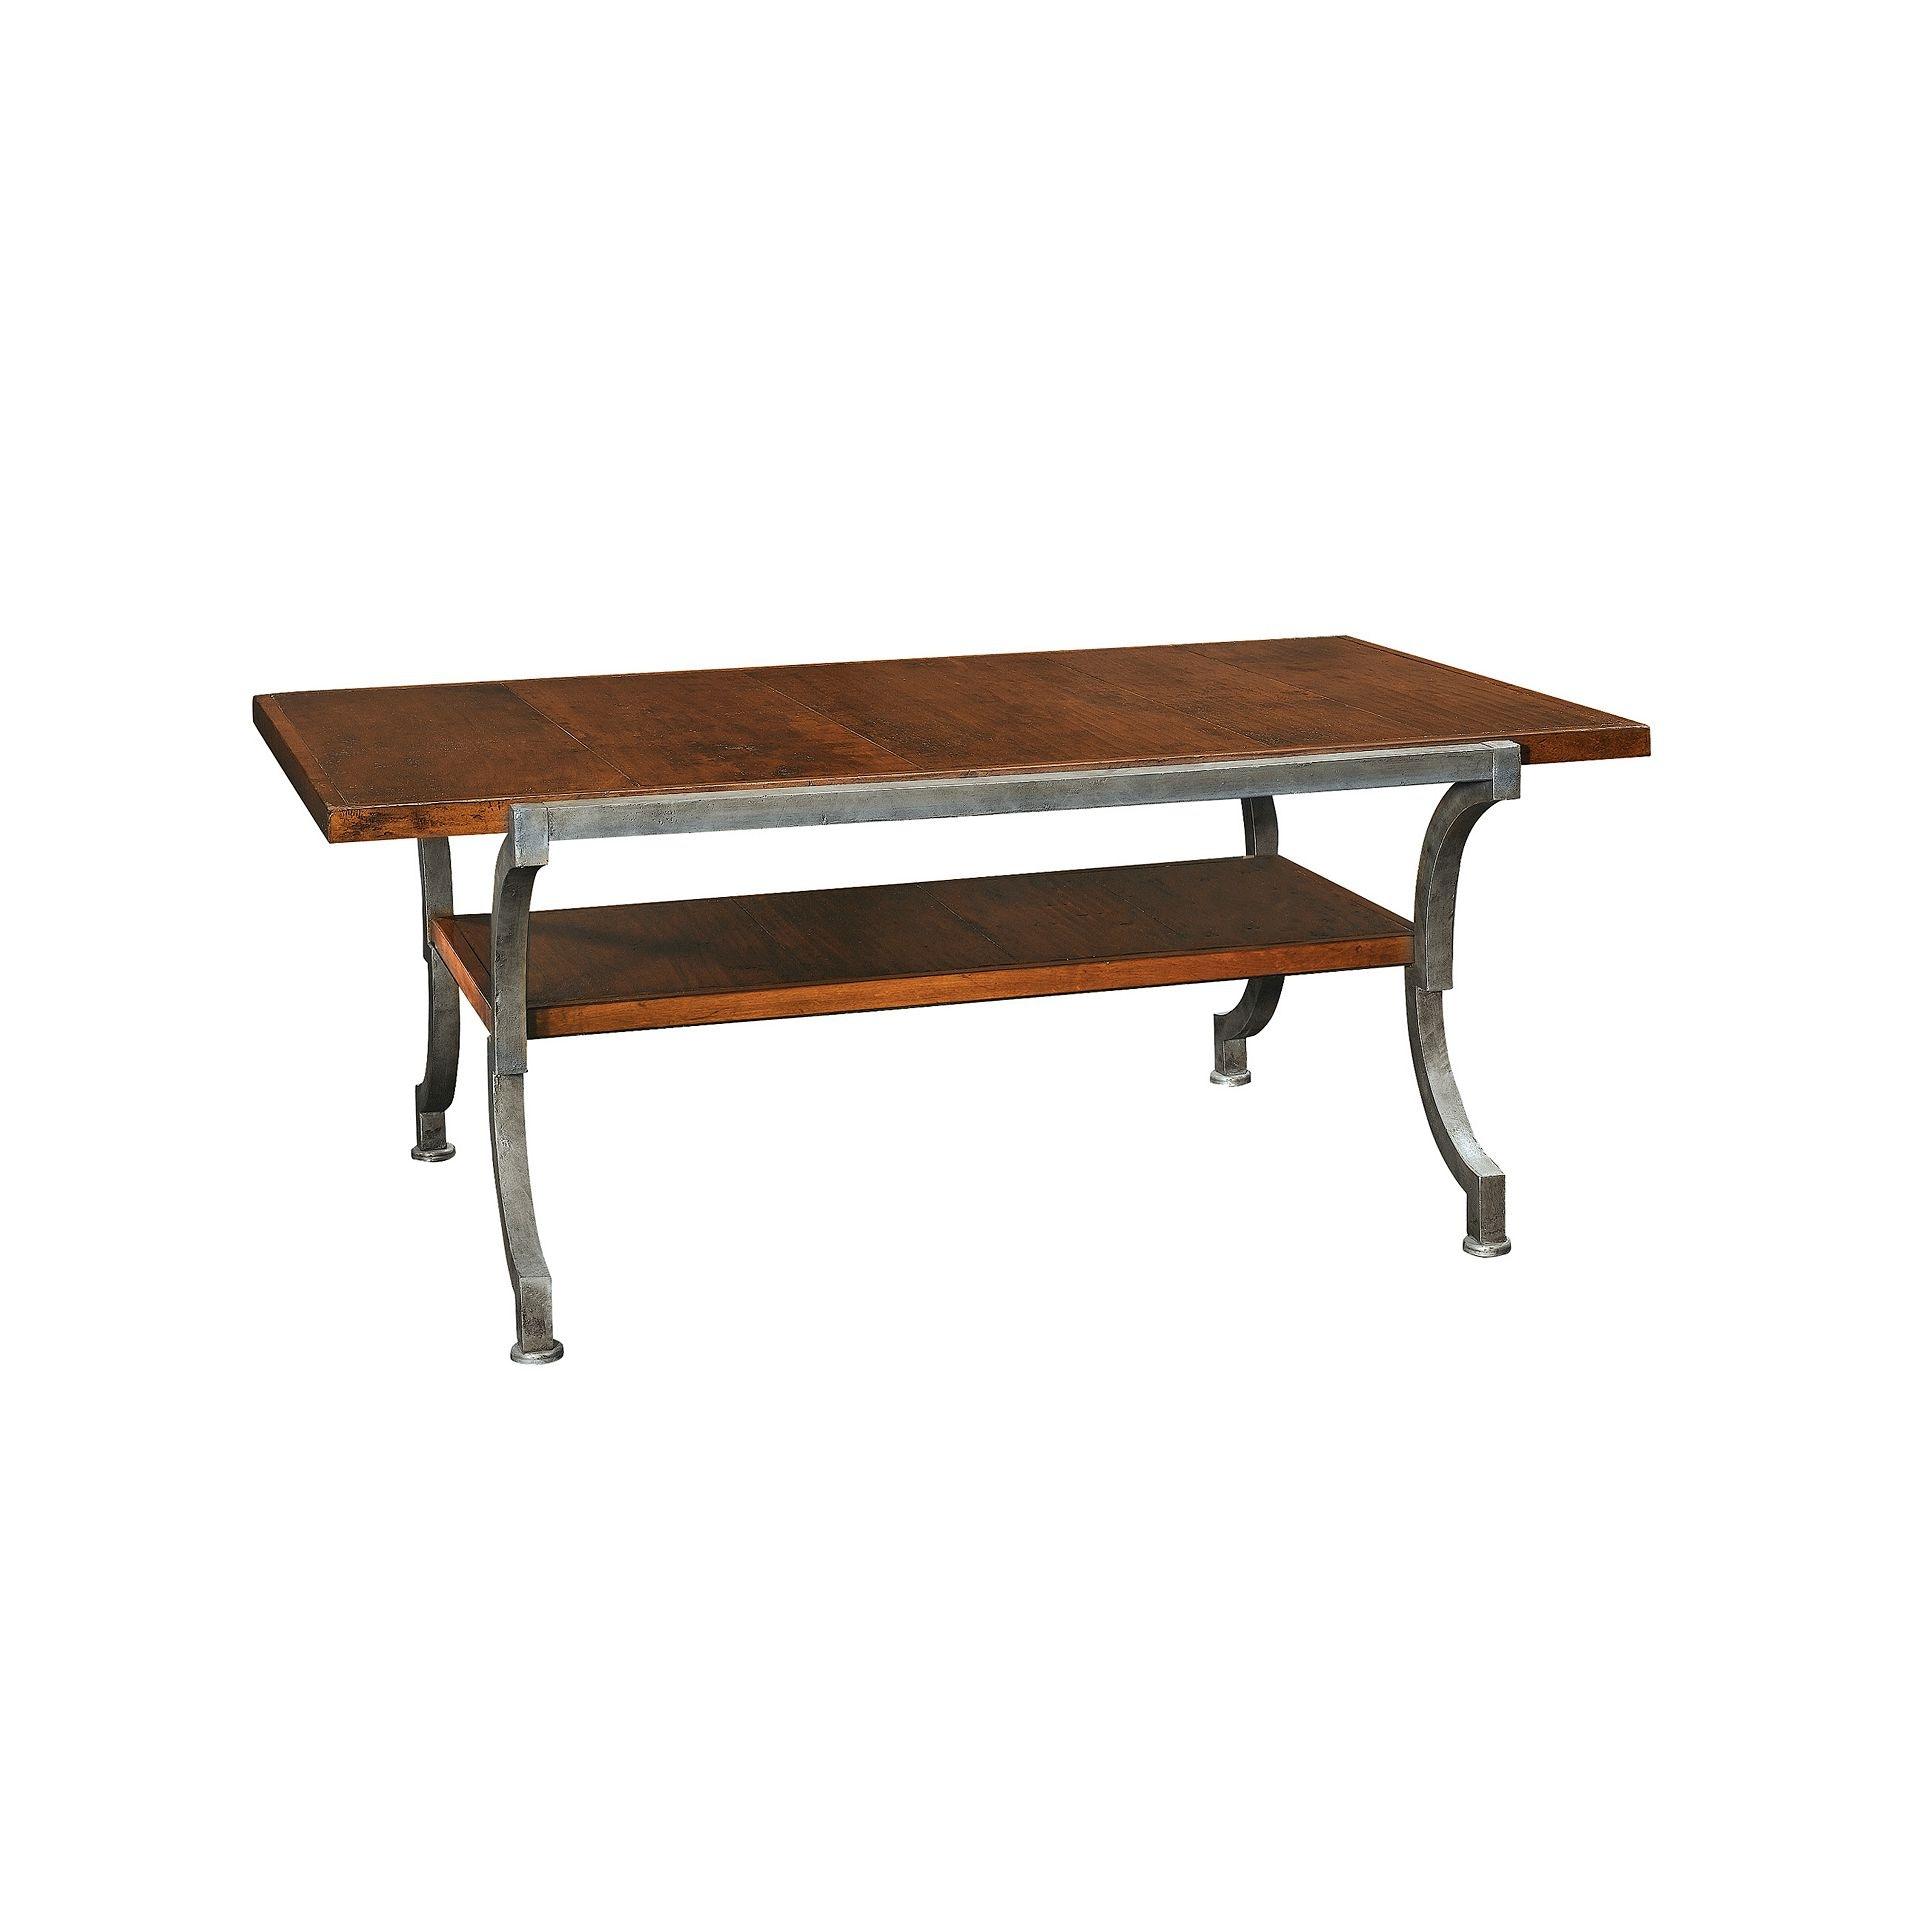 Henredon Furniture 301440 Living Room Acquisitions by Henredon